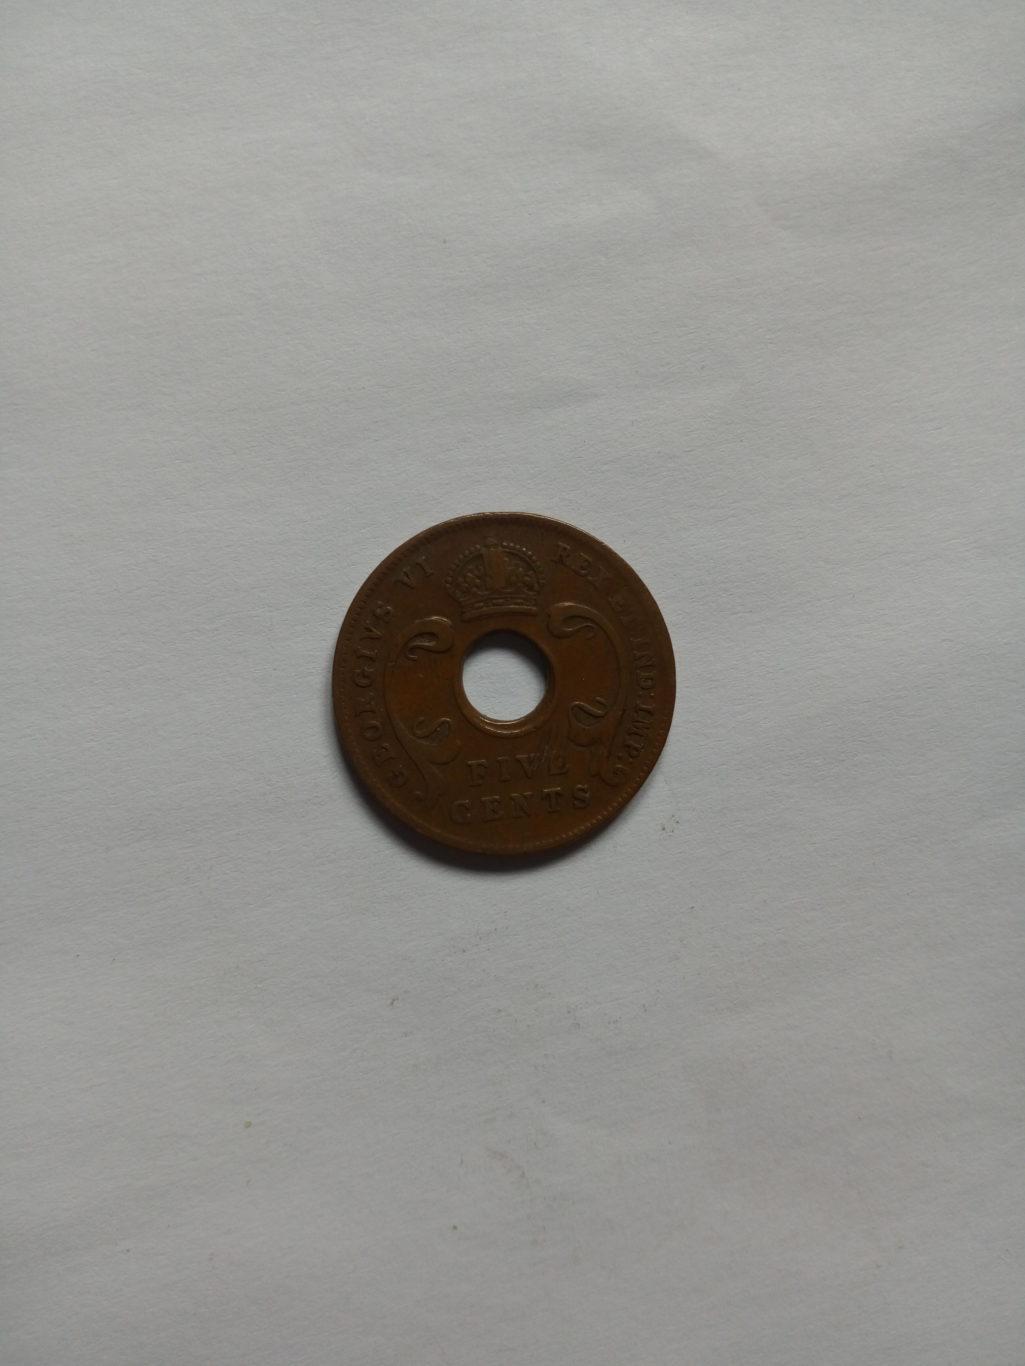 1937_georgivs V1 east Africa 5 cents